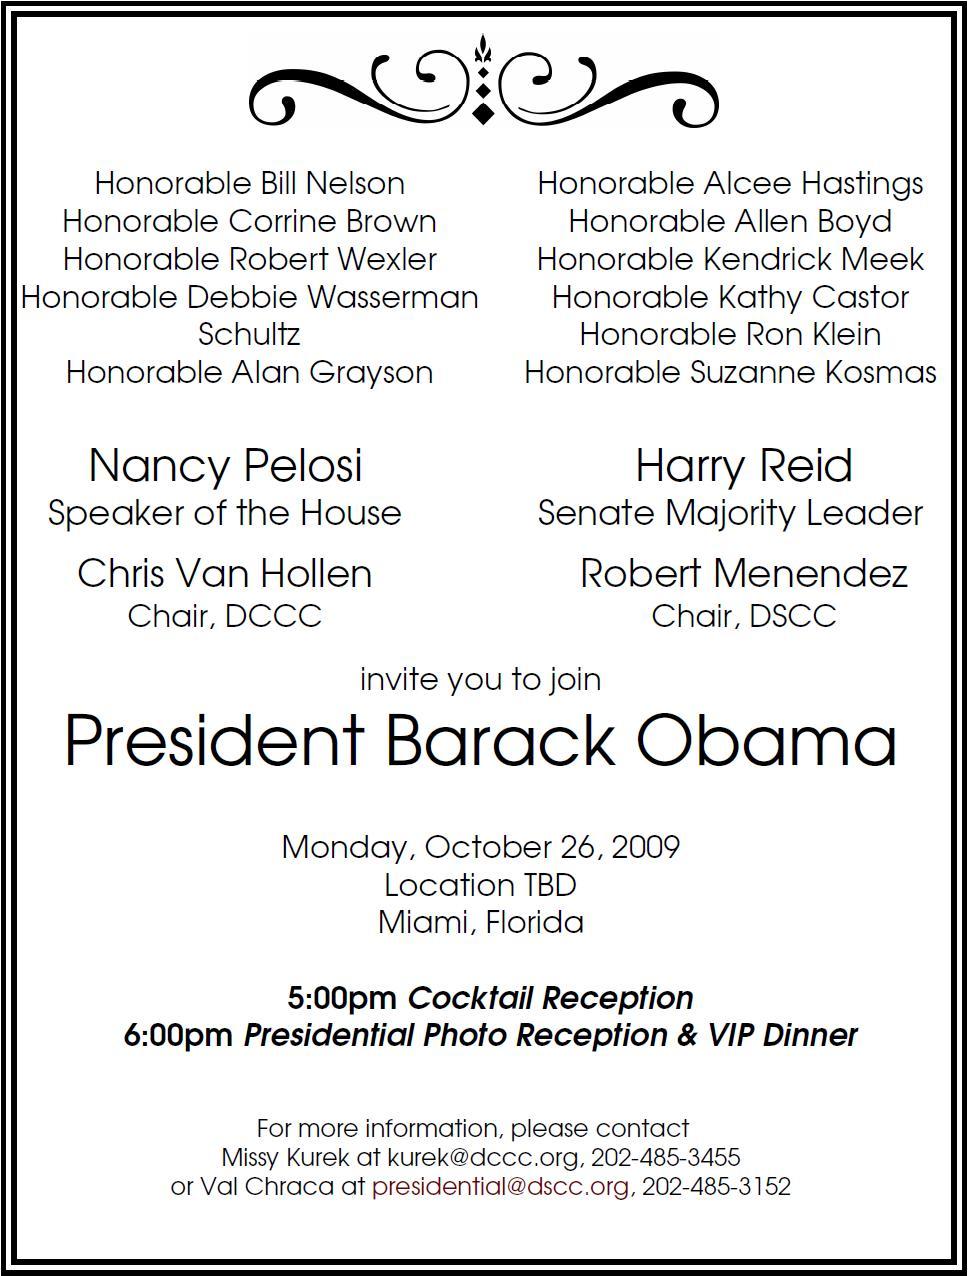 Dine with obama in miami for 100k naked politics miamihsvf xflitez Images